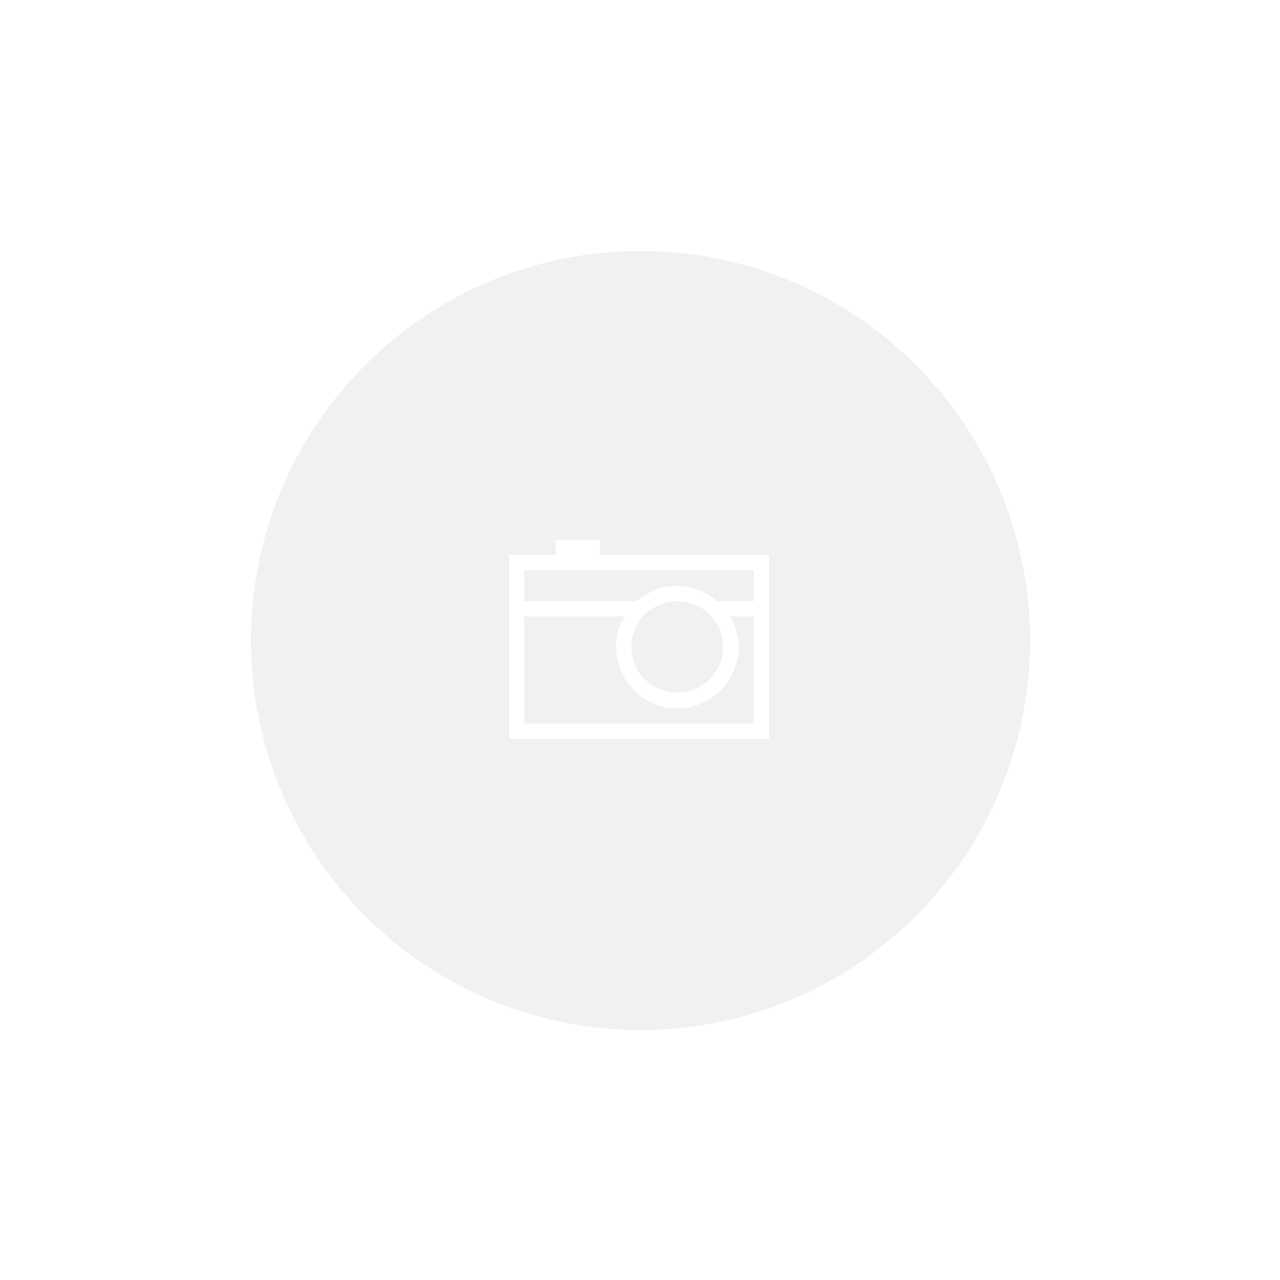 Cobertor Aspen Queen cor Marfim